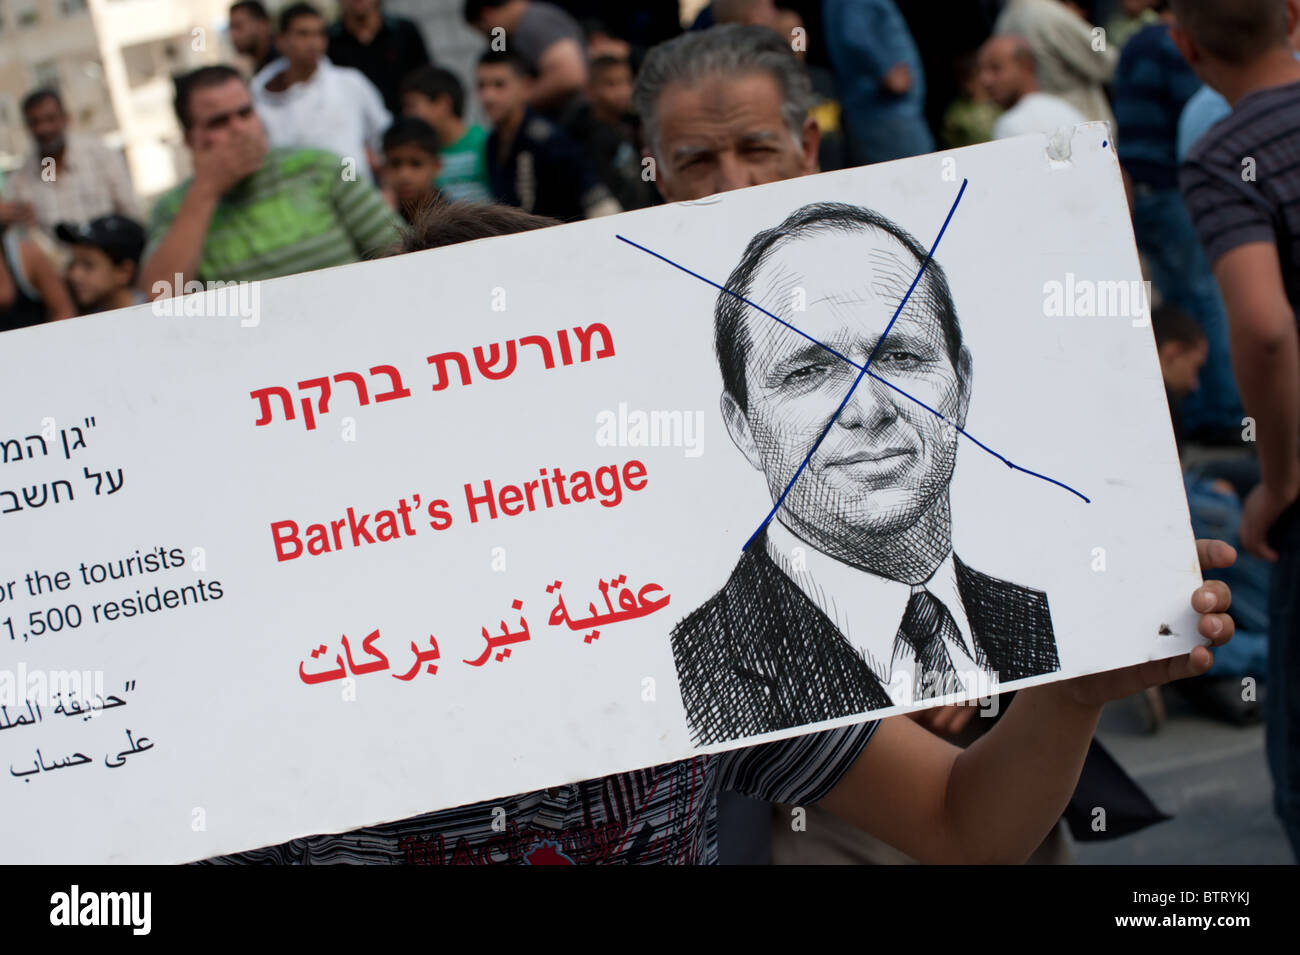 Palestinians in the East Jerusalem neighborhood of Silwan protest Israeli settlements built under Jerusalem Mayor - Stock Image